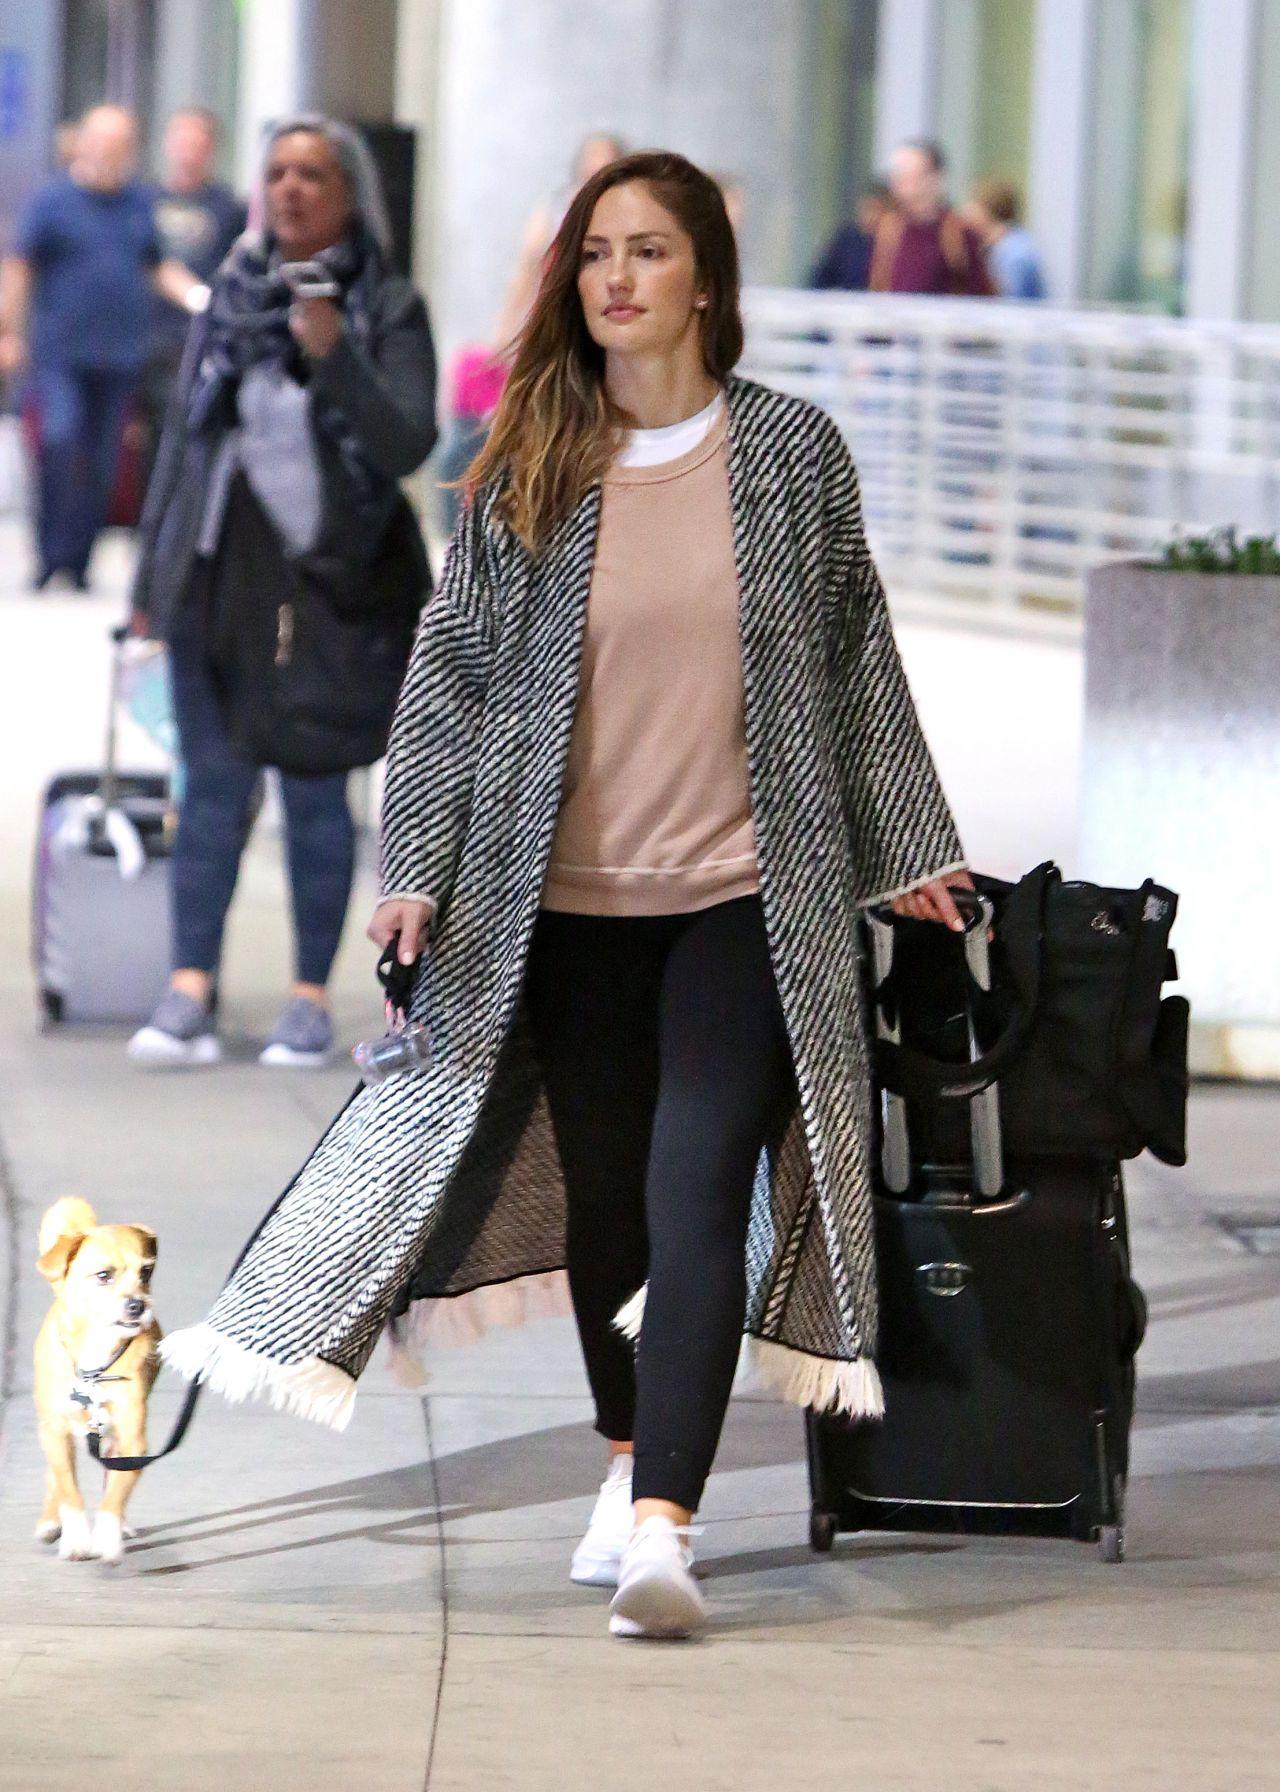 Minka Kelly Arrives In Toronto 05 21 2018